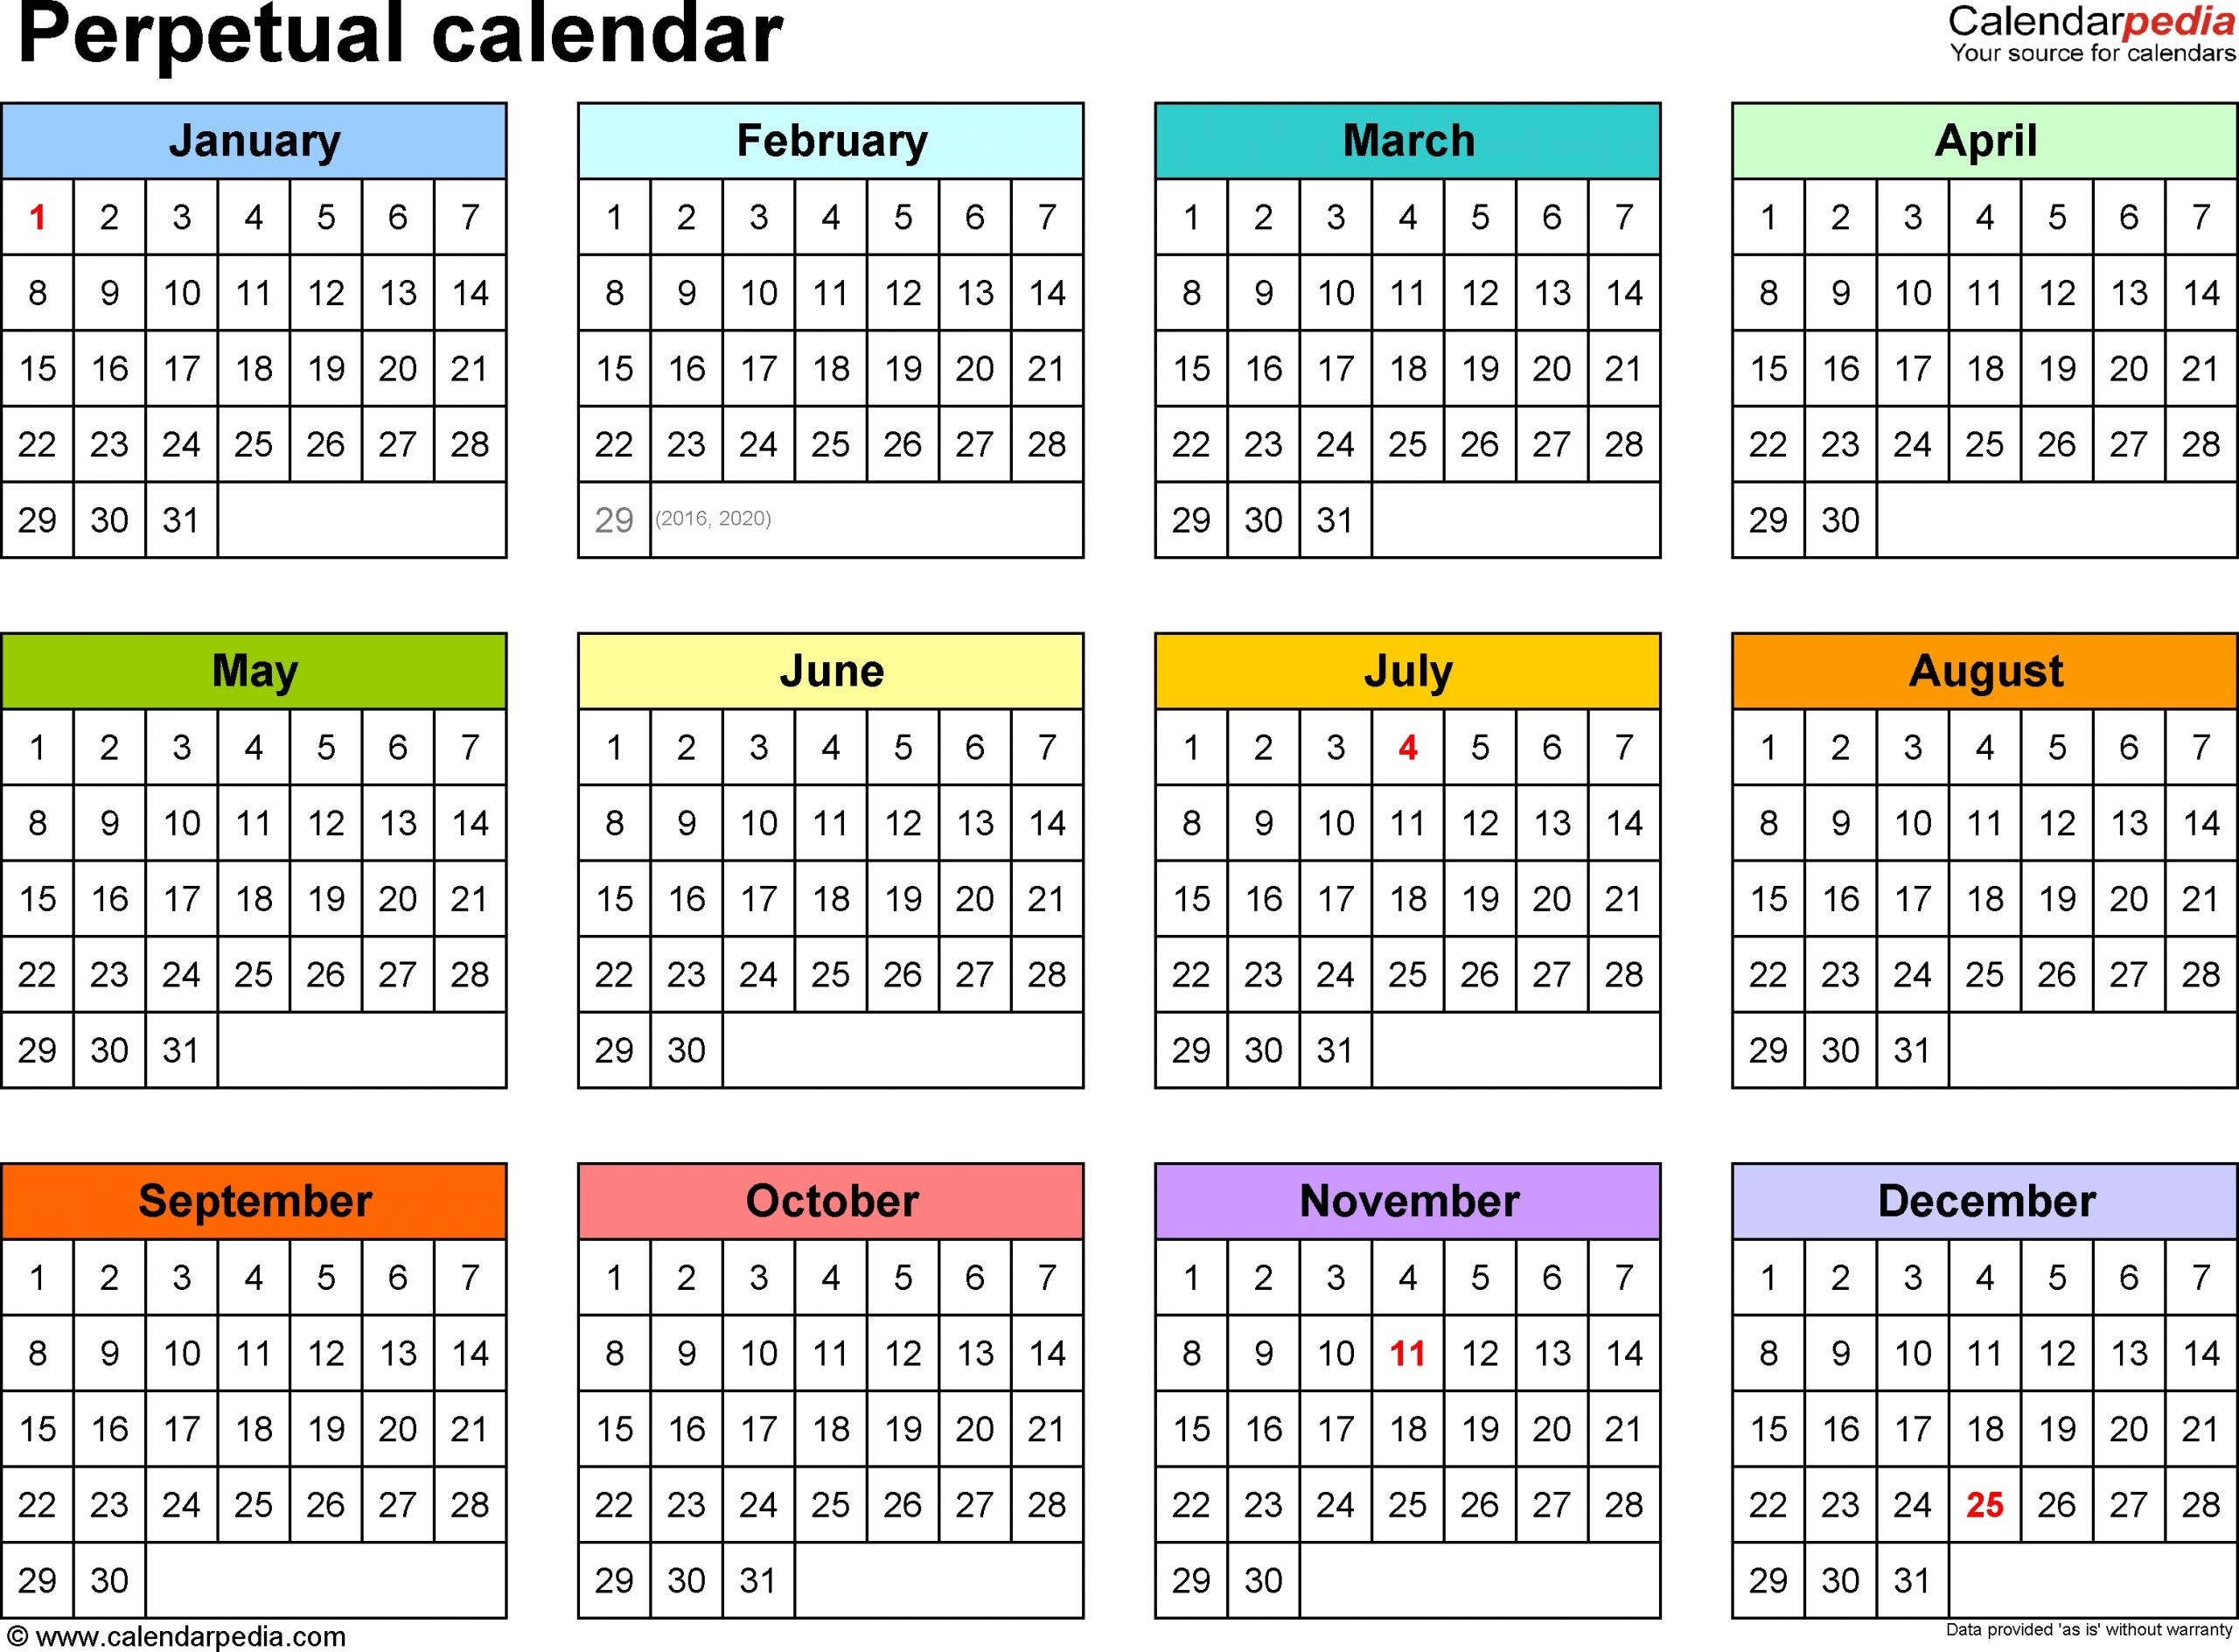 Pick Free Printable Blank Perpetual Calendars